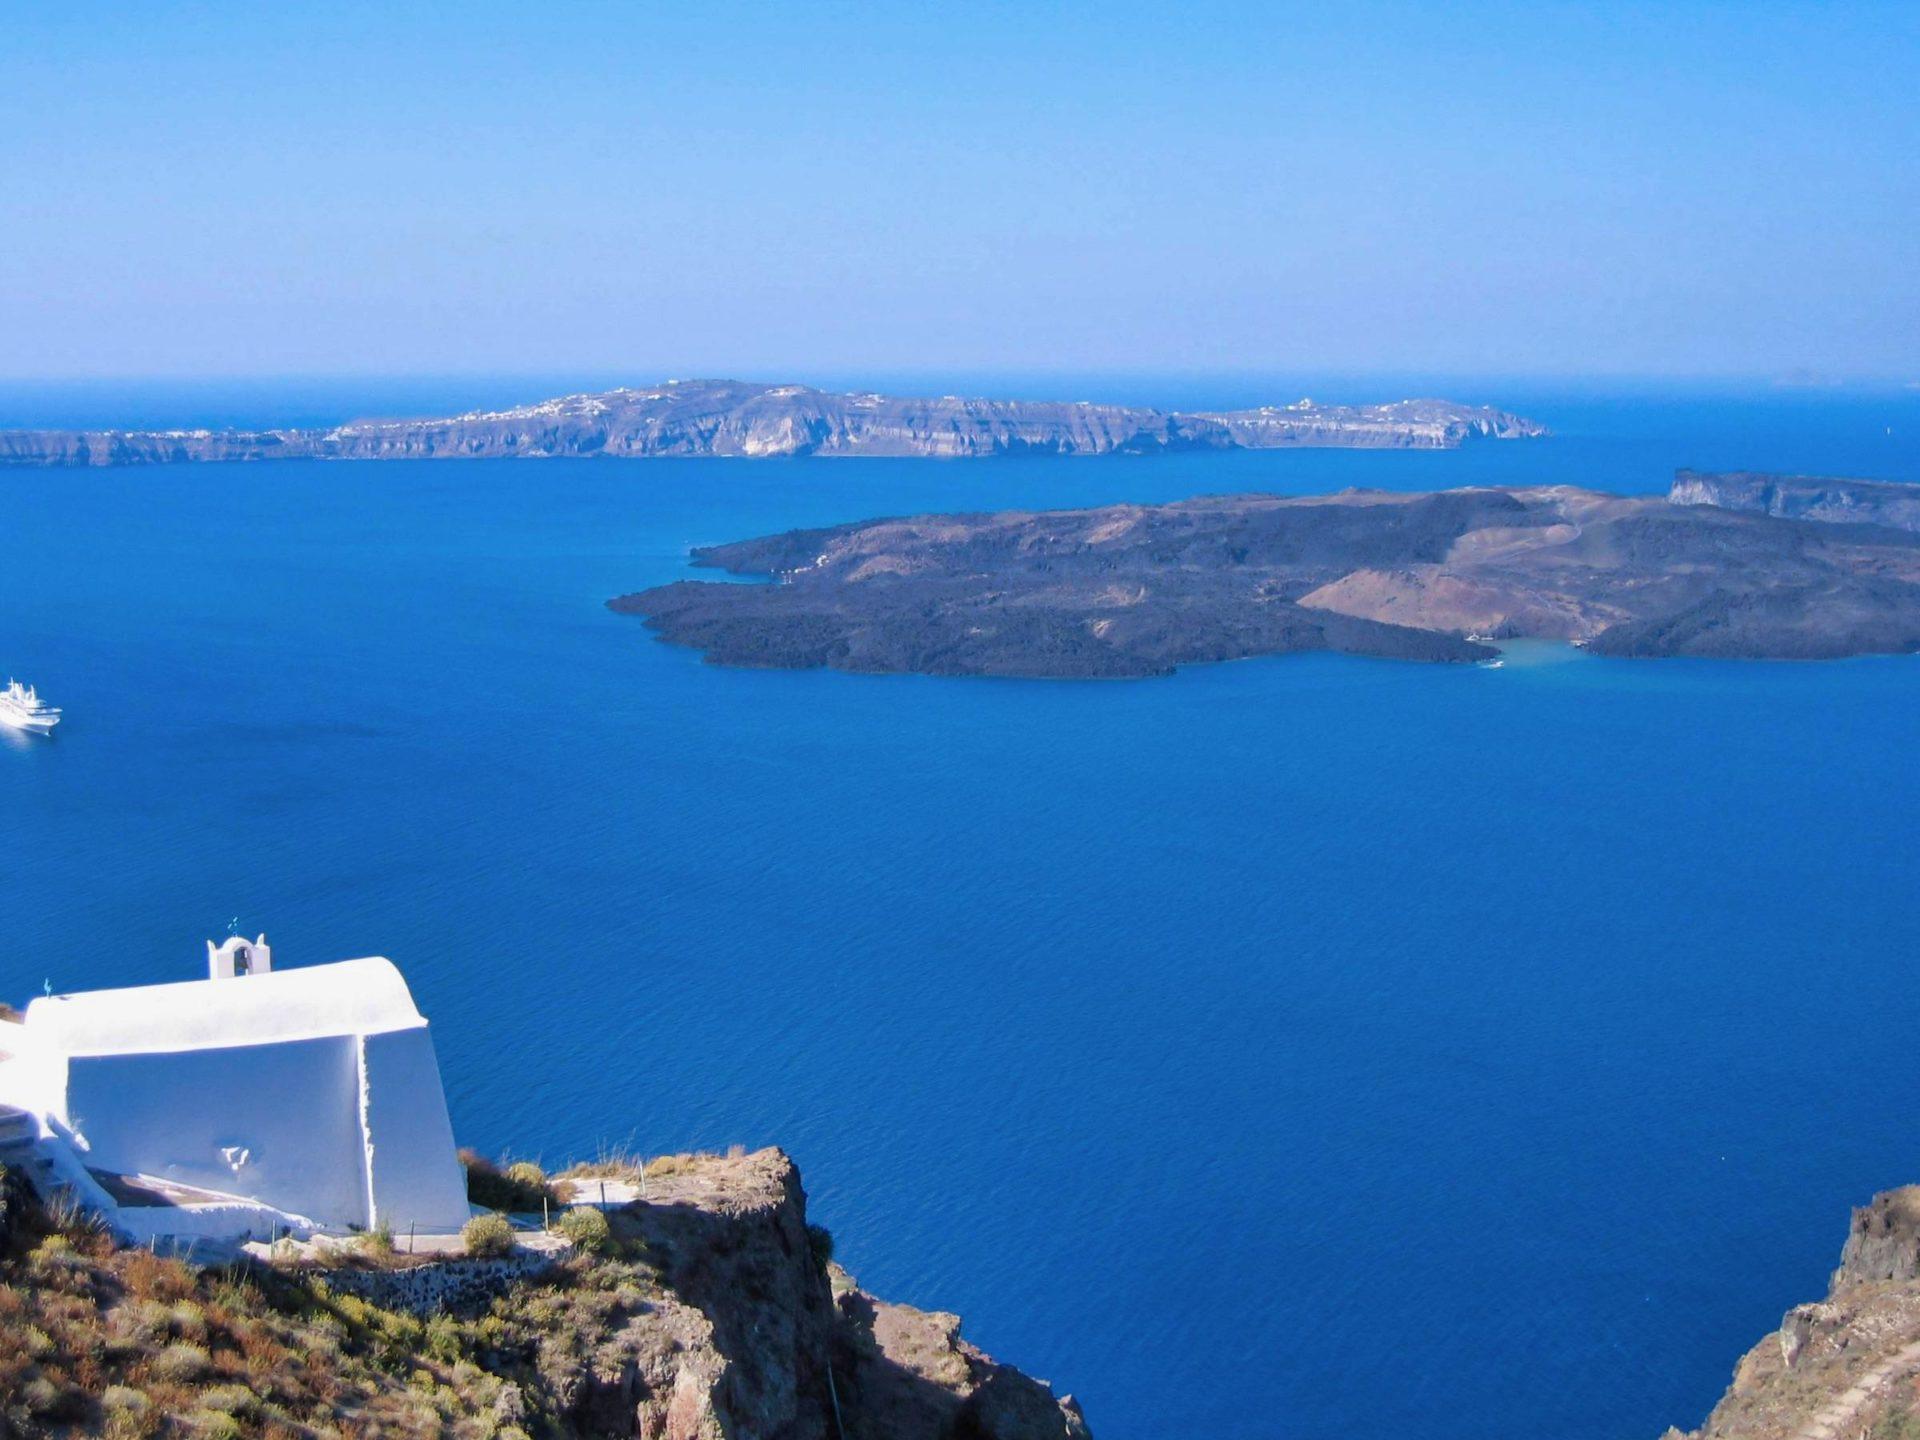 Santorini is so stunningly beautiful, it makes Crete look like garbage.